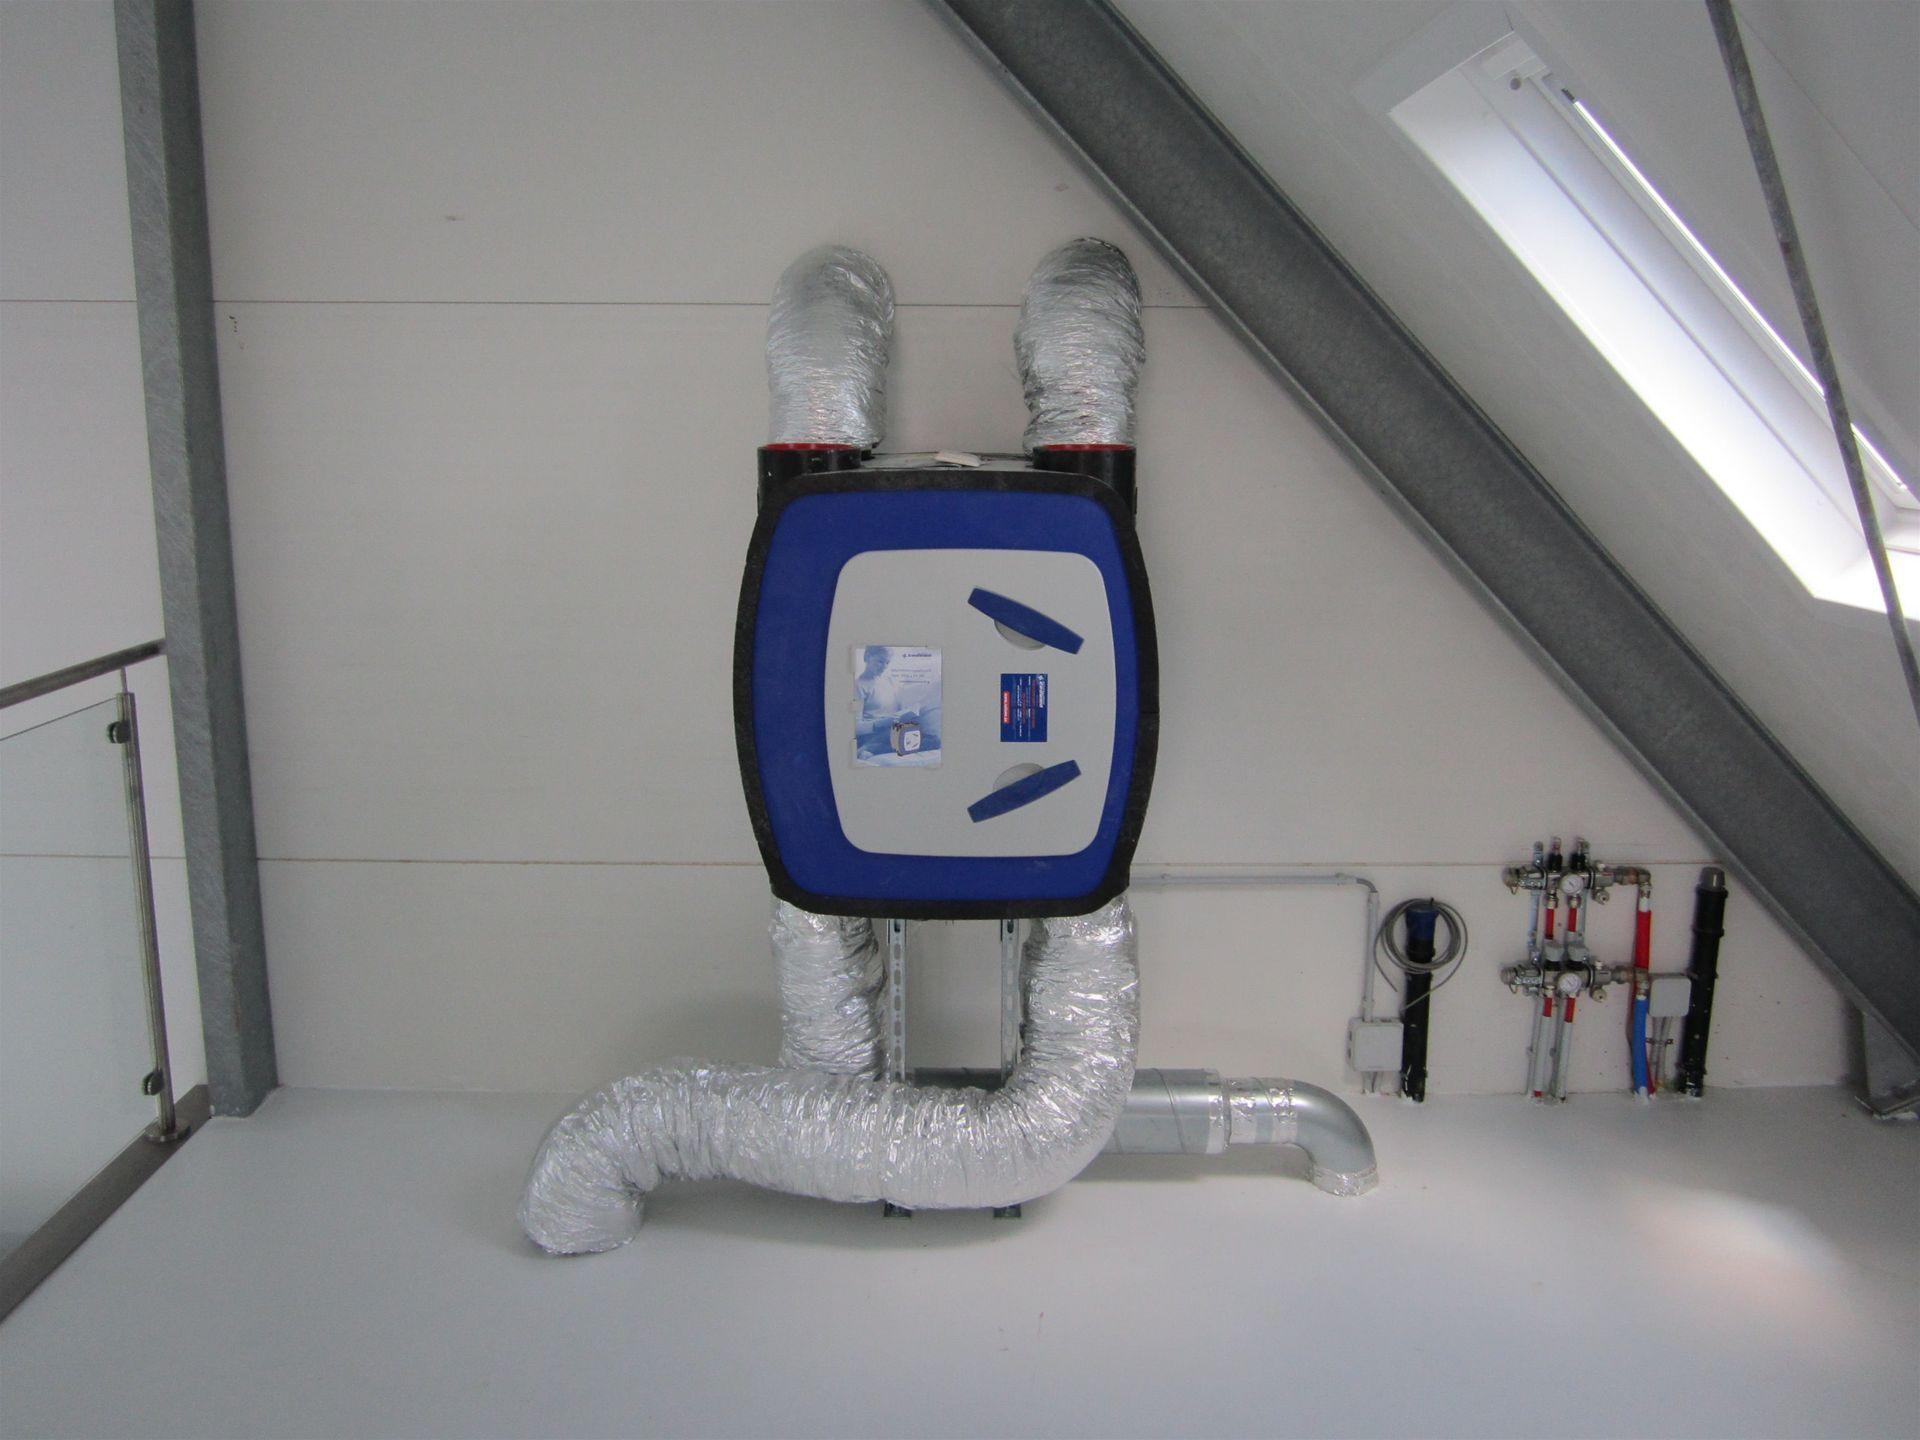 JC Techniek | Ventilatie | Luchttechniek | Luchttransport |Anzegem | Ventilatieprojecten